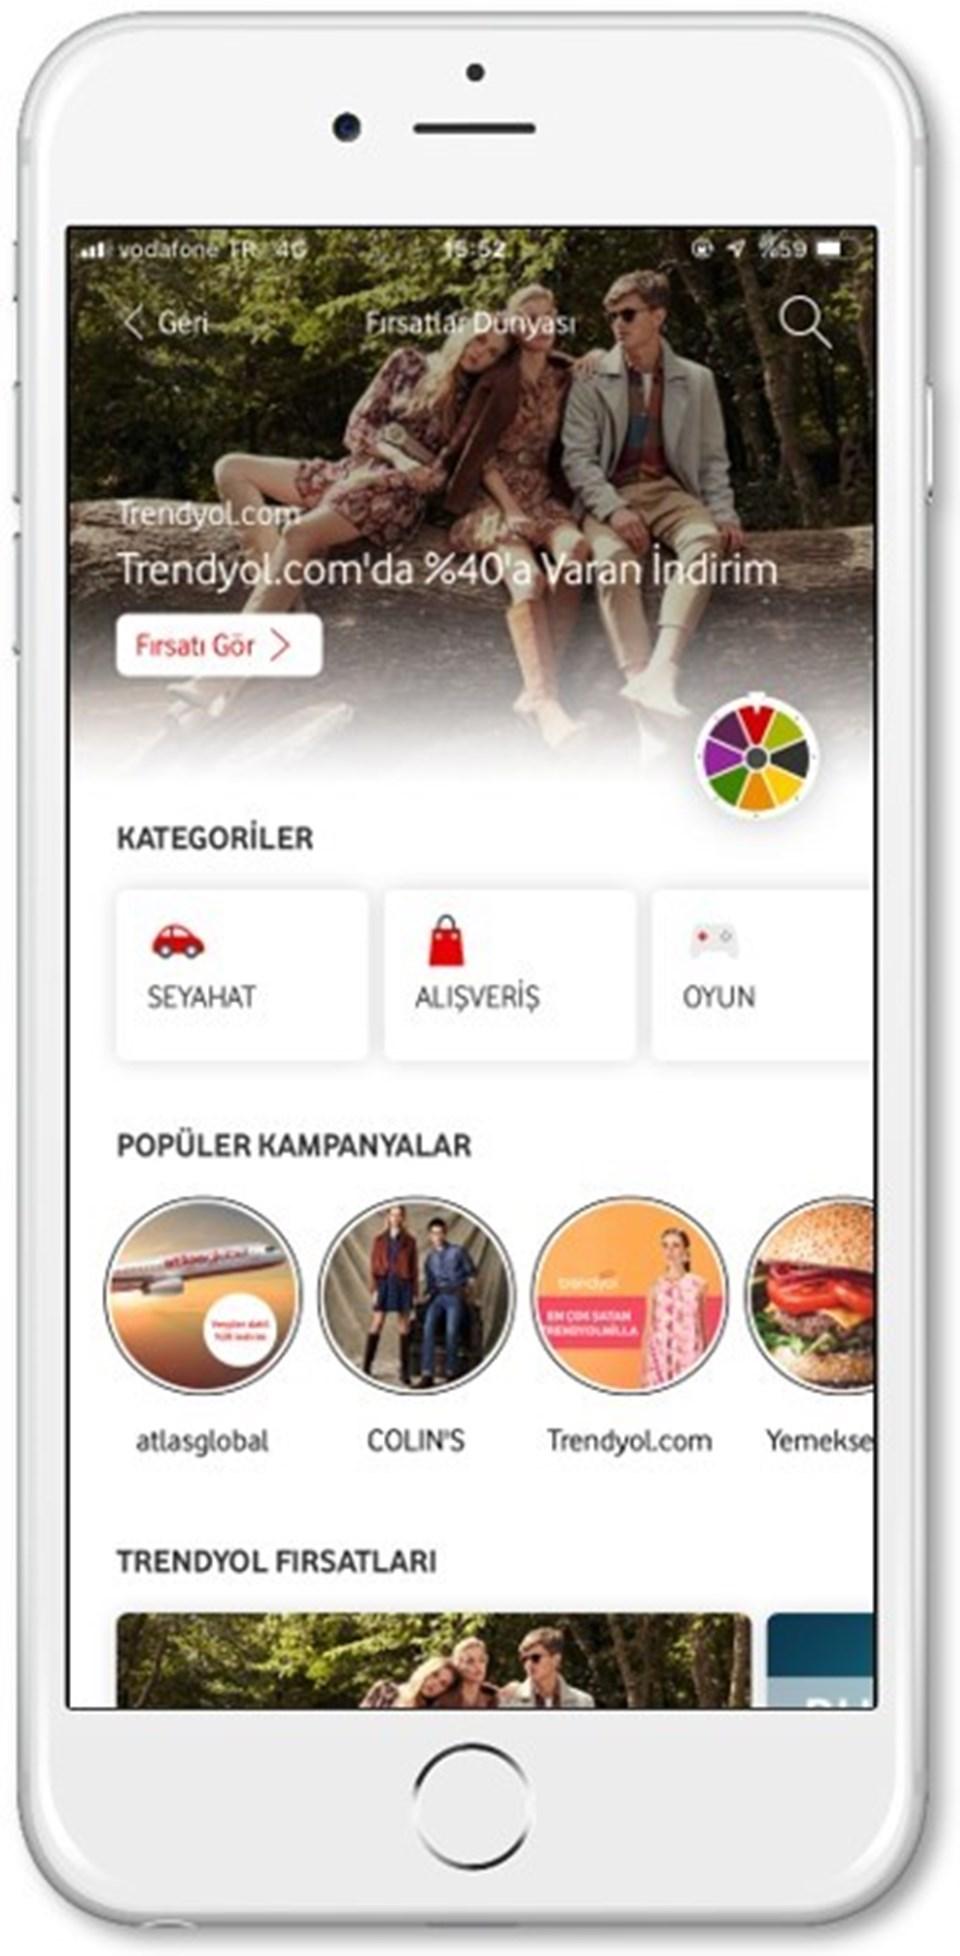 Vodafone'un yeni ekosistemi içinde yer alan bazı markalar şunlar: Oyna Kazan, Tavla Stars, Zula, Zynga, Scotty, Glovo, Aras Kargo, Levent Lostra, Otovınn, Octovan, E-Ofis, Sosyopix, Generali, DasDas, Busuu, Atlasglobal, Turna.com, Budget, Hotels.com, ISG, TAV, VIP Transfer,Storytel, Vodafone TV, Yemeksepeti, HD iskender, Papa John's, Big Chefs, Pideköy, Fitwell, Diyetkolik, Meditopia, Dalyan Club, Trendyol, Colin's, Kiğılı, Flo, Samsung, Homend, Goldmaster...